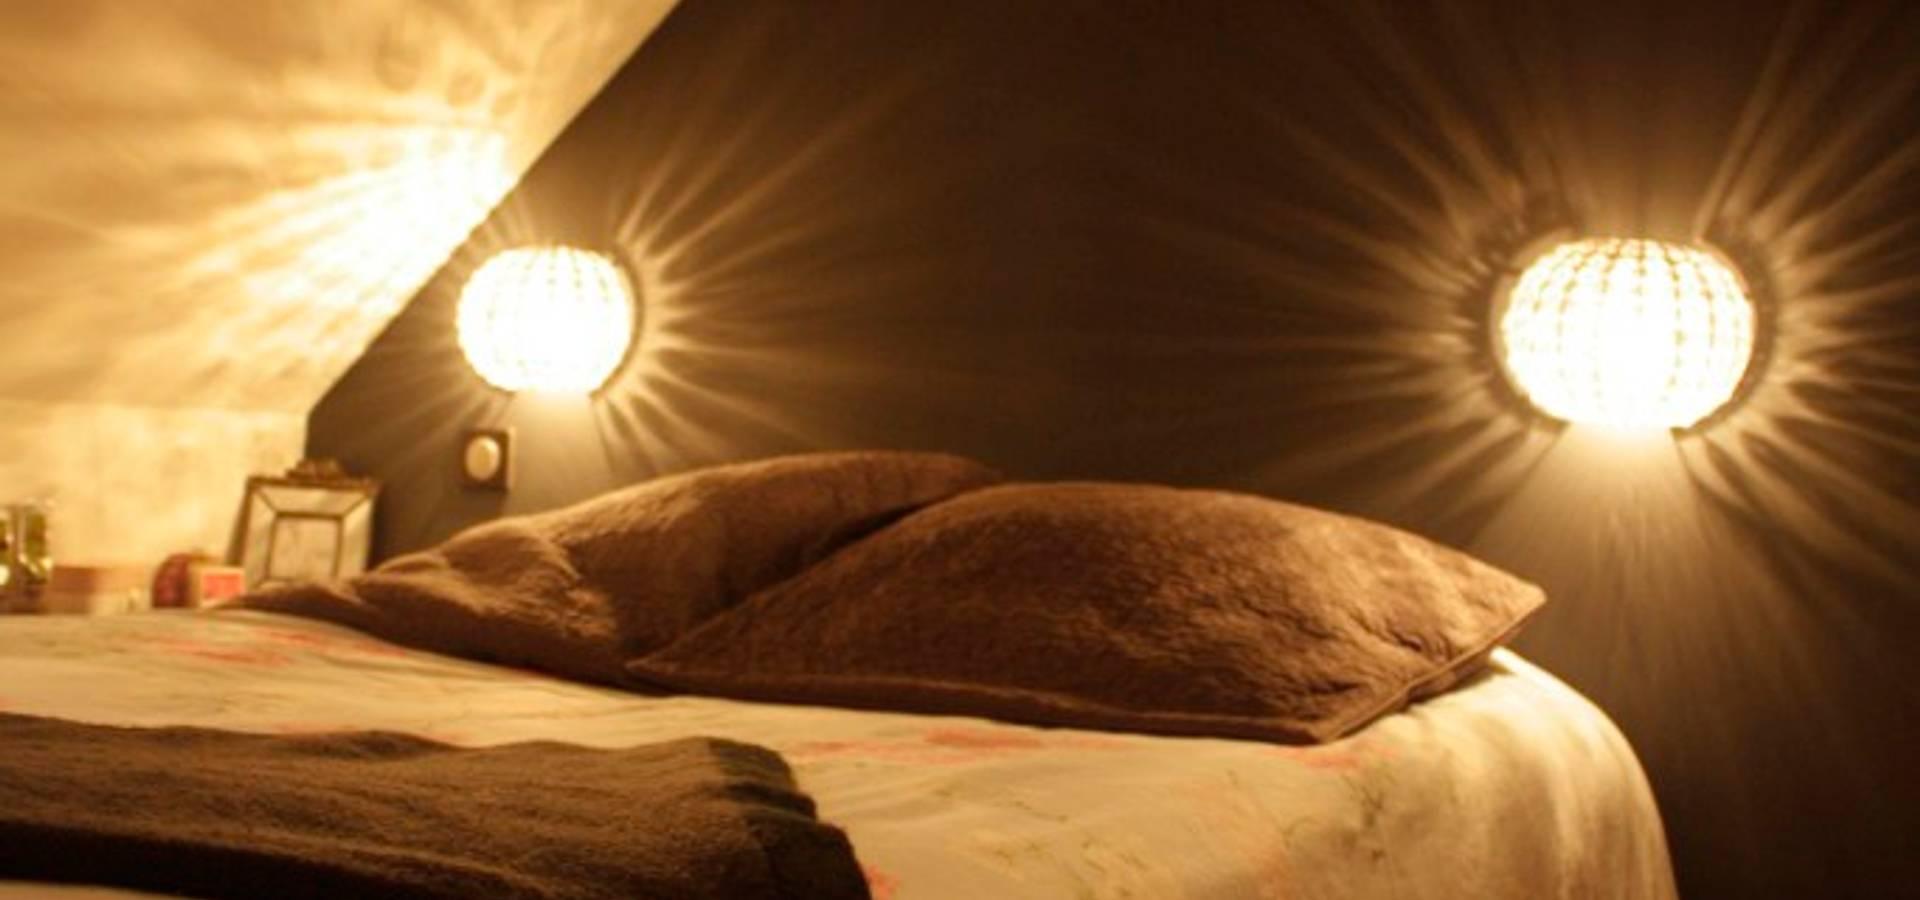 liza badet architecte d 39 int rieur architectes d. Black Bedroom Furniture Sets. Home Design Ideas